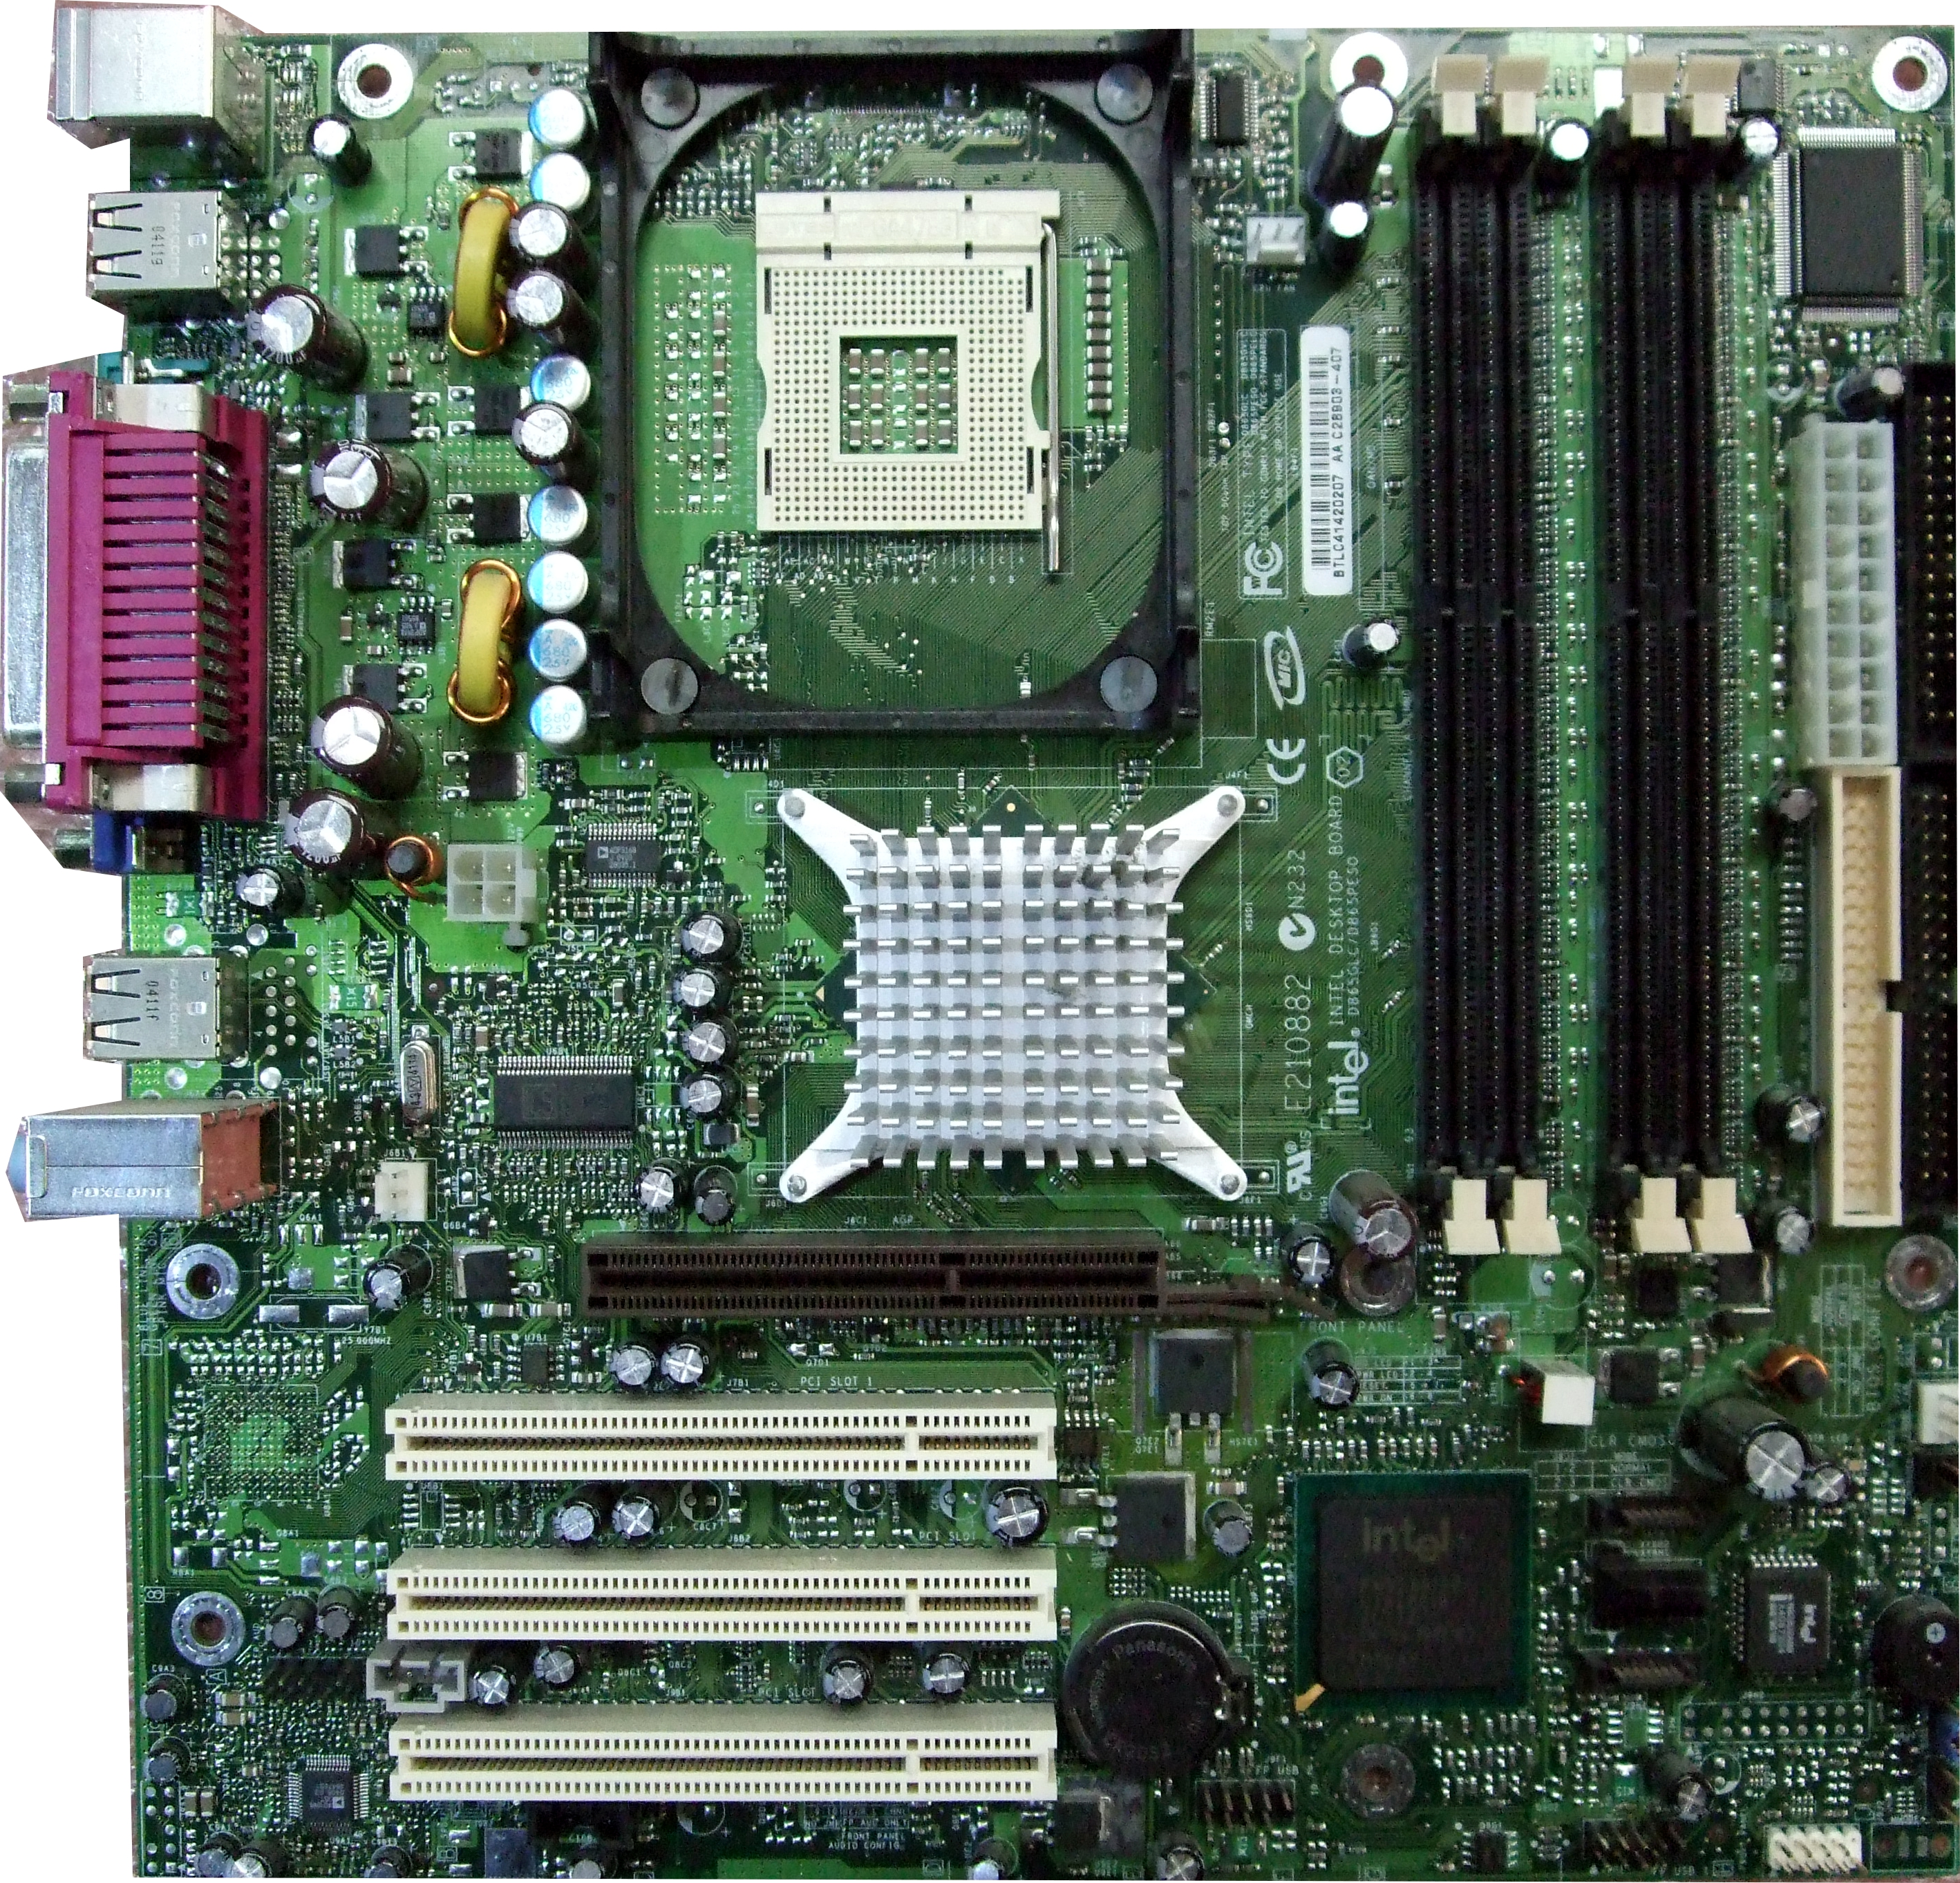 d865glc motherboard manual free owners manual u2022 rh wordworksbysea com V Desktop Intel E210882 Motherboard Diagnostics intel d865glc d865peso motherboard manual